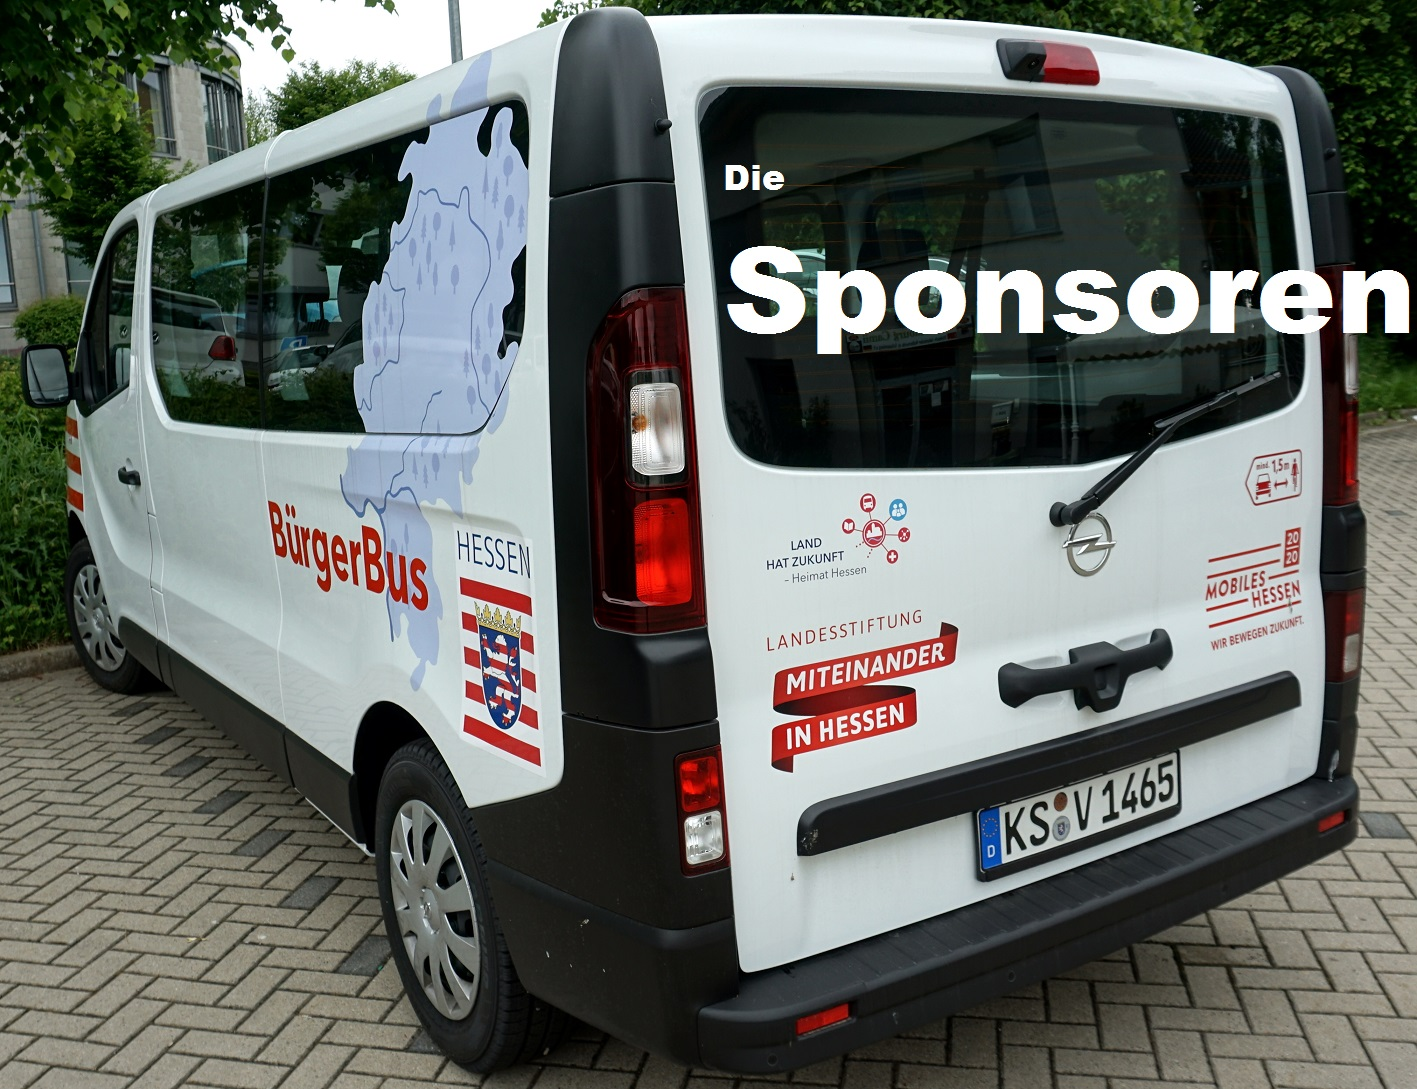 Buergerbus Die Sponsoren